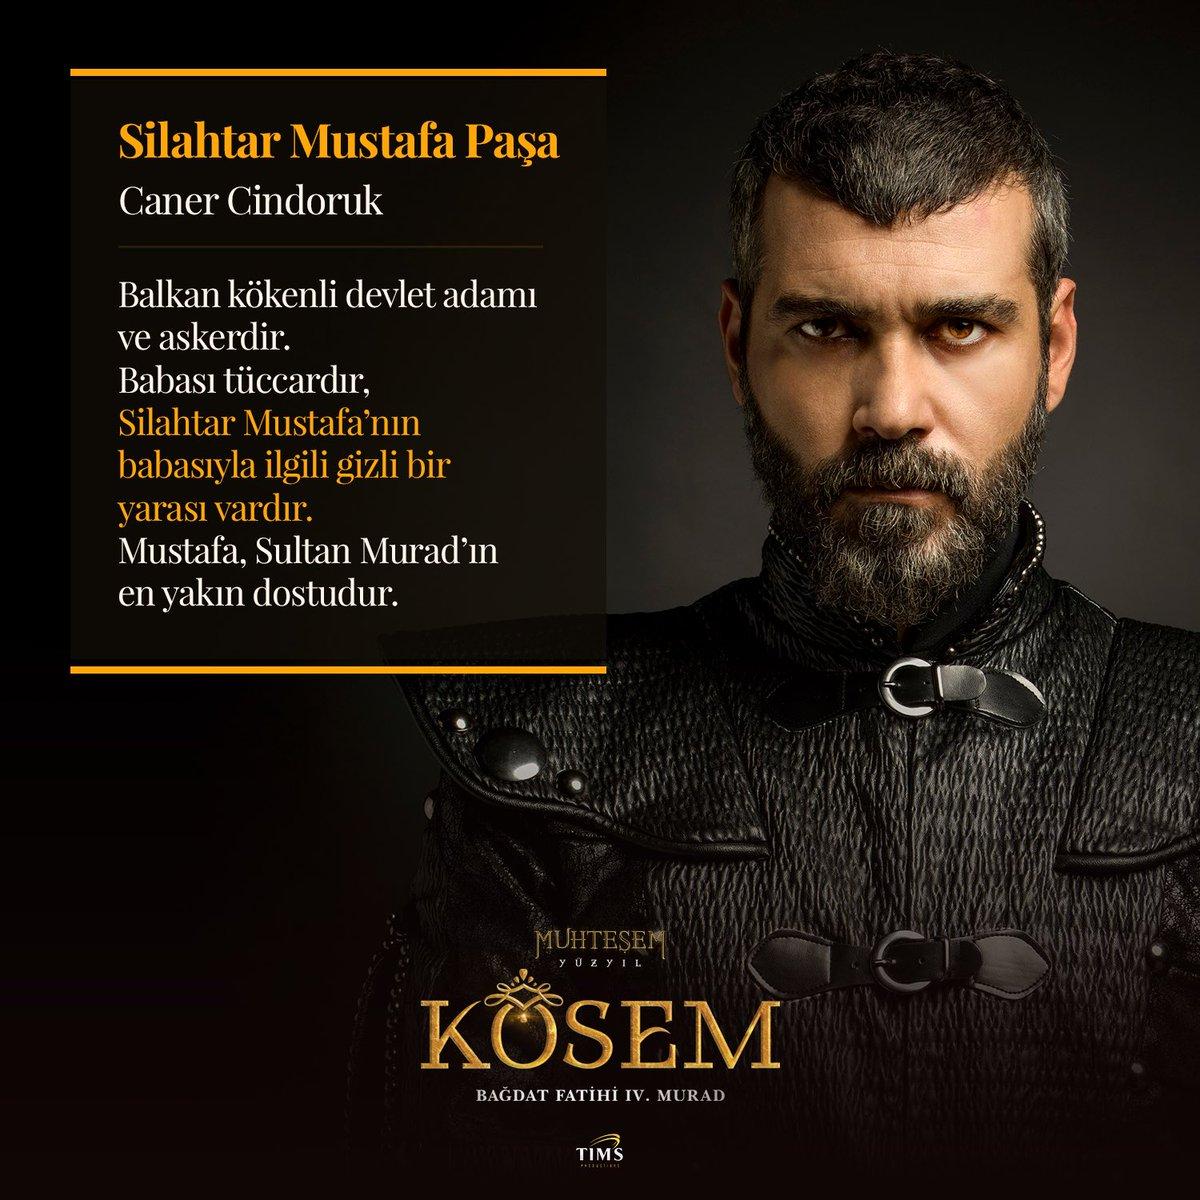 Великолепный век. Кесем - 2 сезон - Muhteşem Yüzyıl Kösem PROMO (Silahtar Mustafa Pasa).jpg